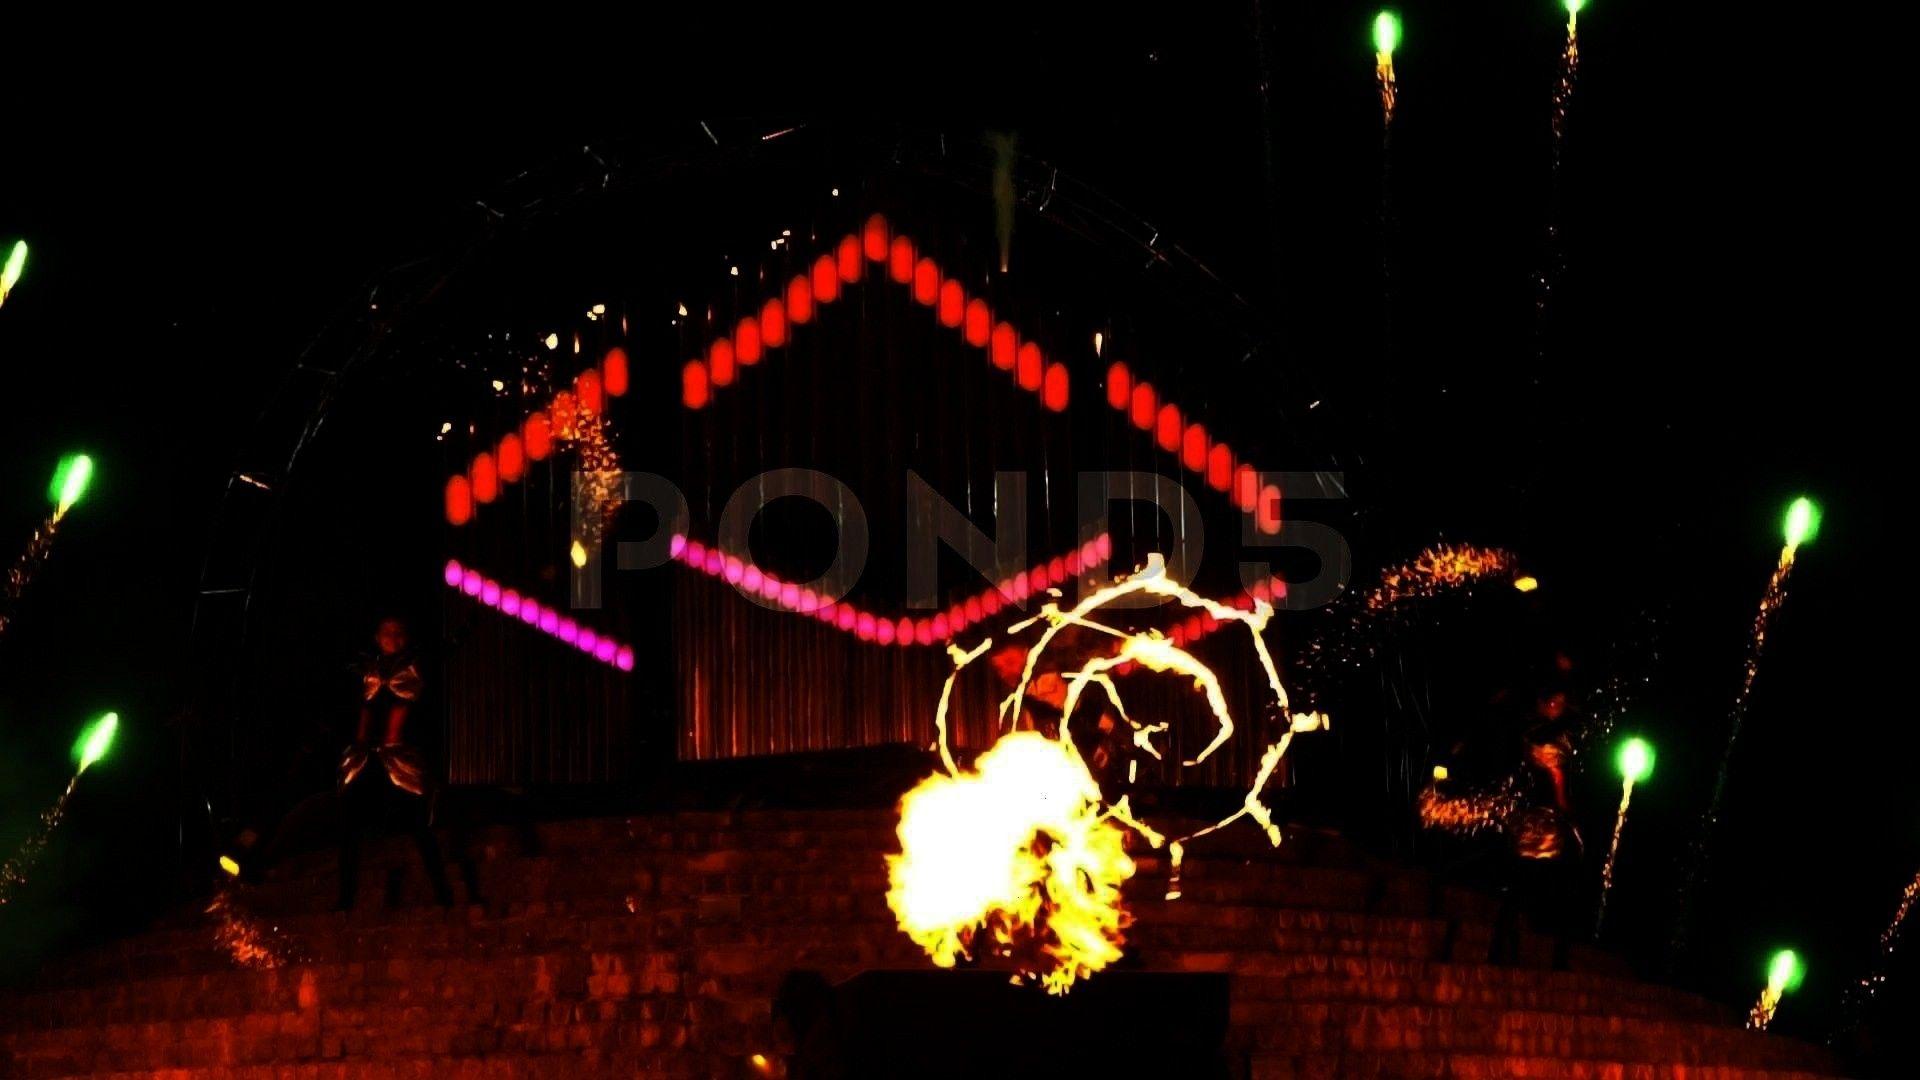 #peopleperformingcamerarises #performing #firecamera #stockrises #risesfrom #personal #footage #trai...